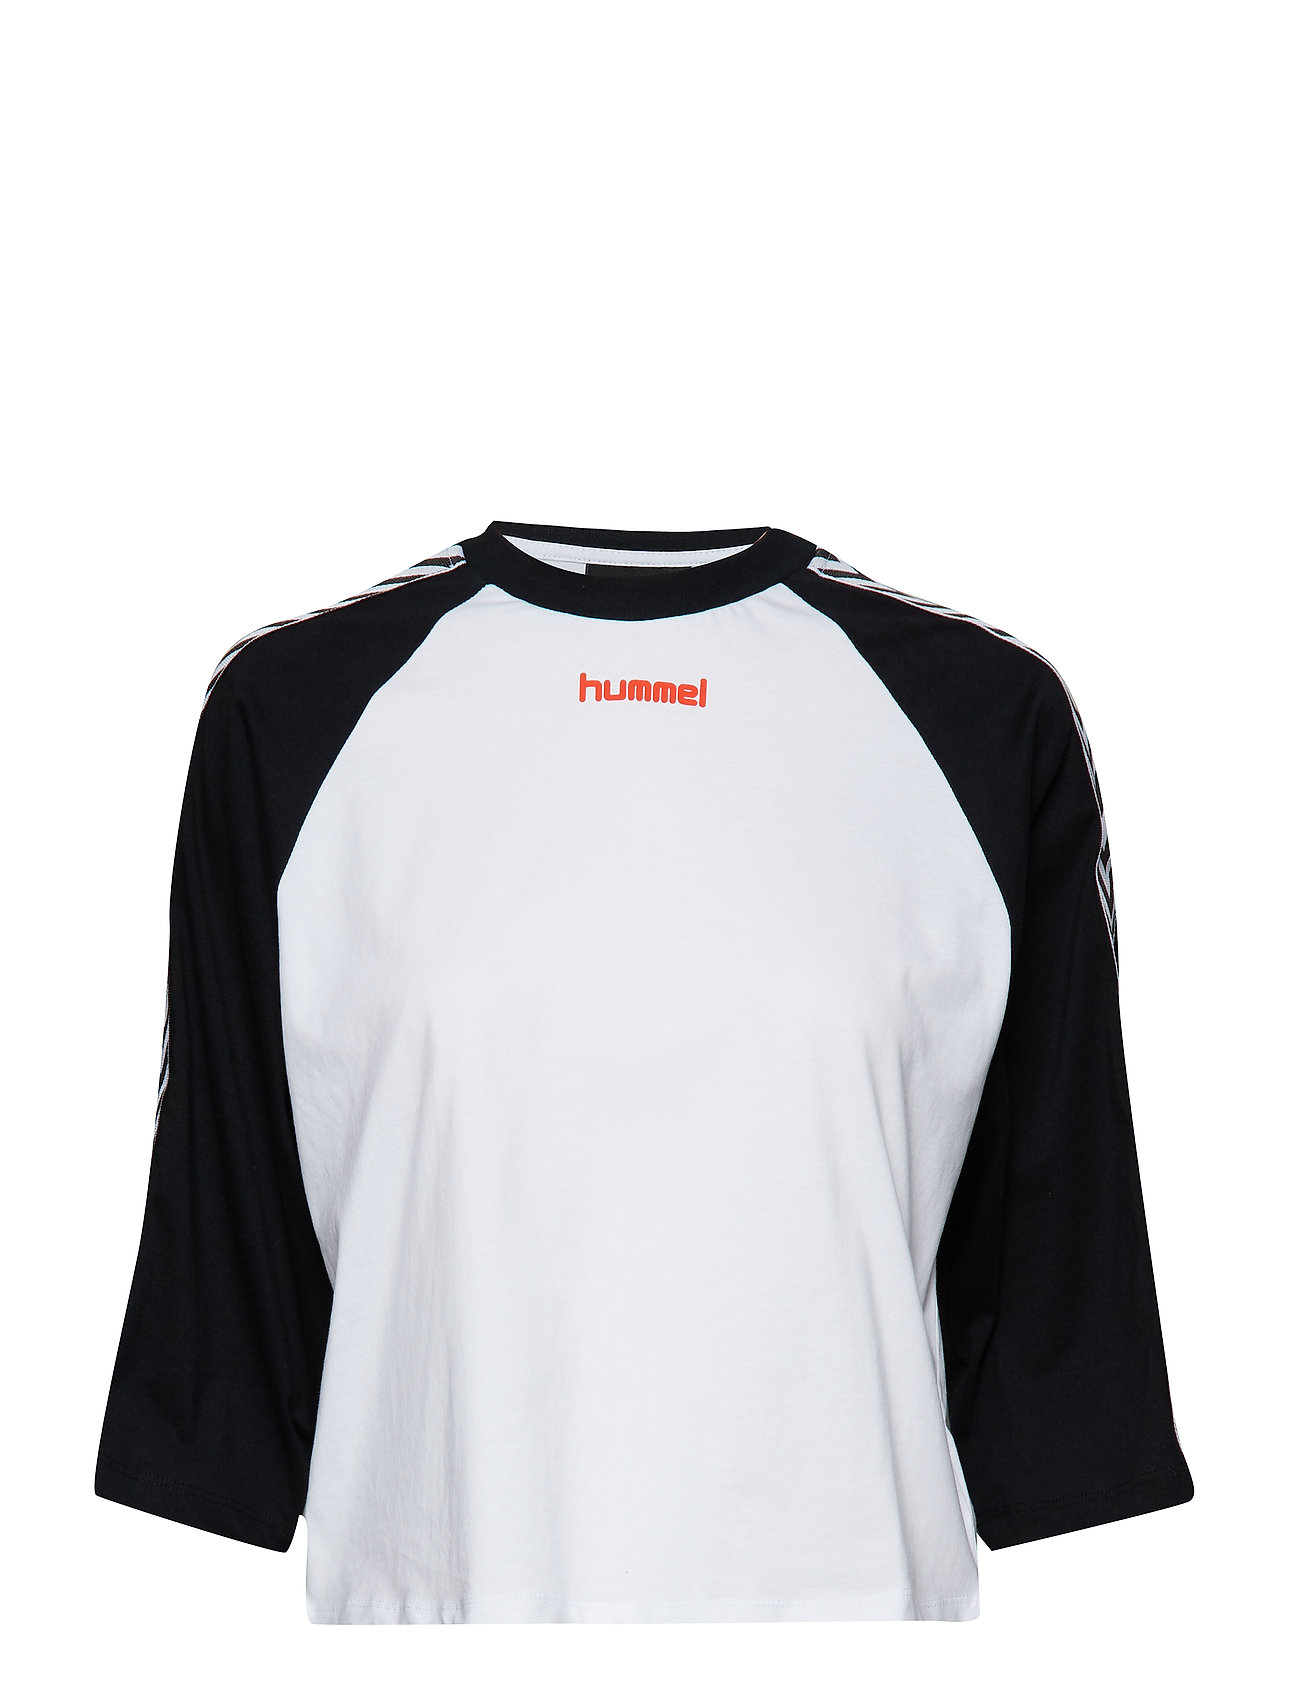 Hmlaida T Shirt SS Langærmet T shirt Hvid HUMMEL HIVE